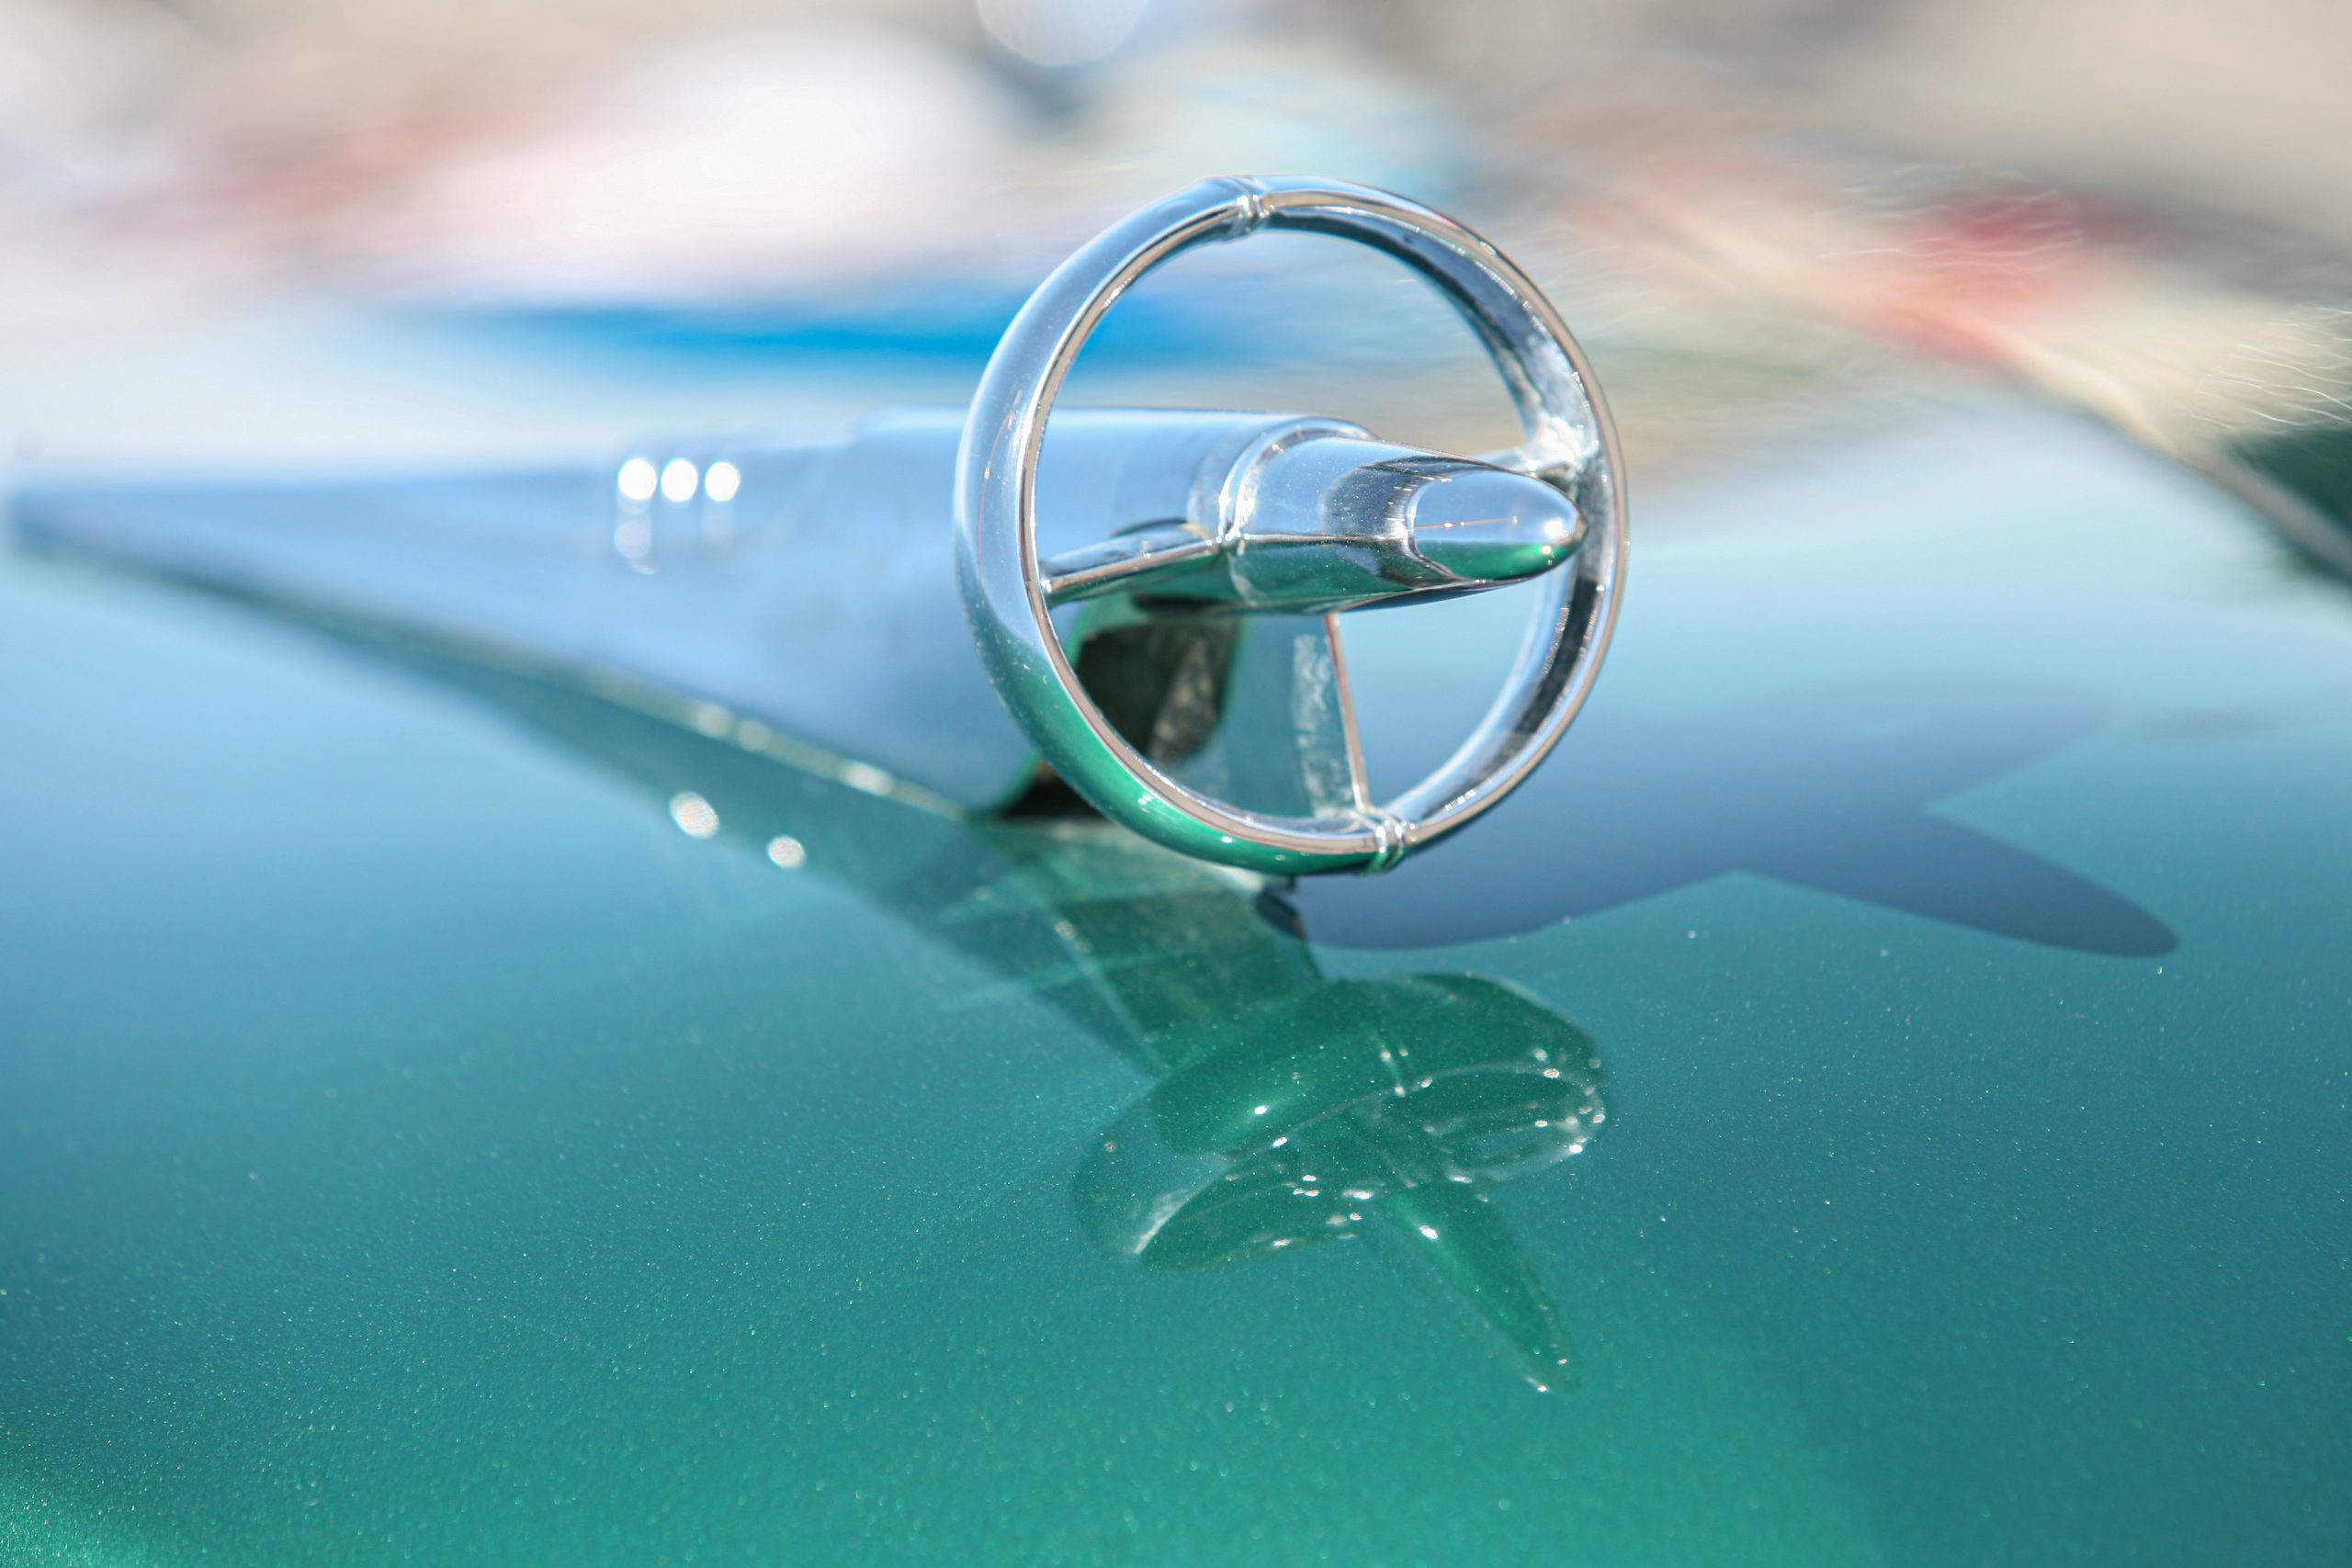 1951 Buick Hood ornament gun sight